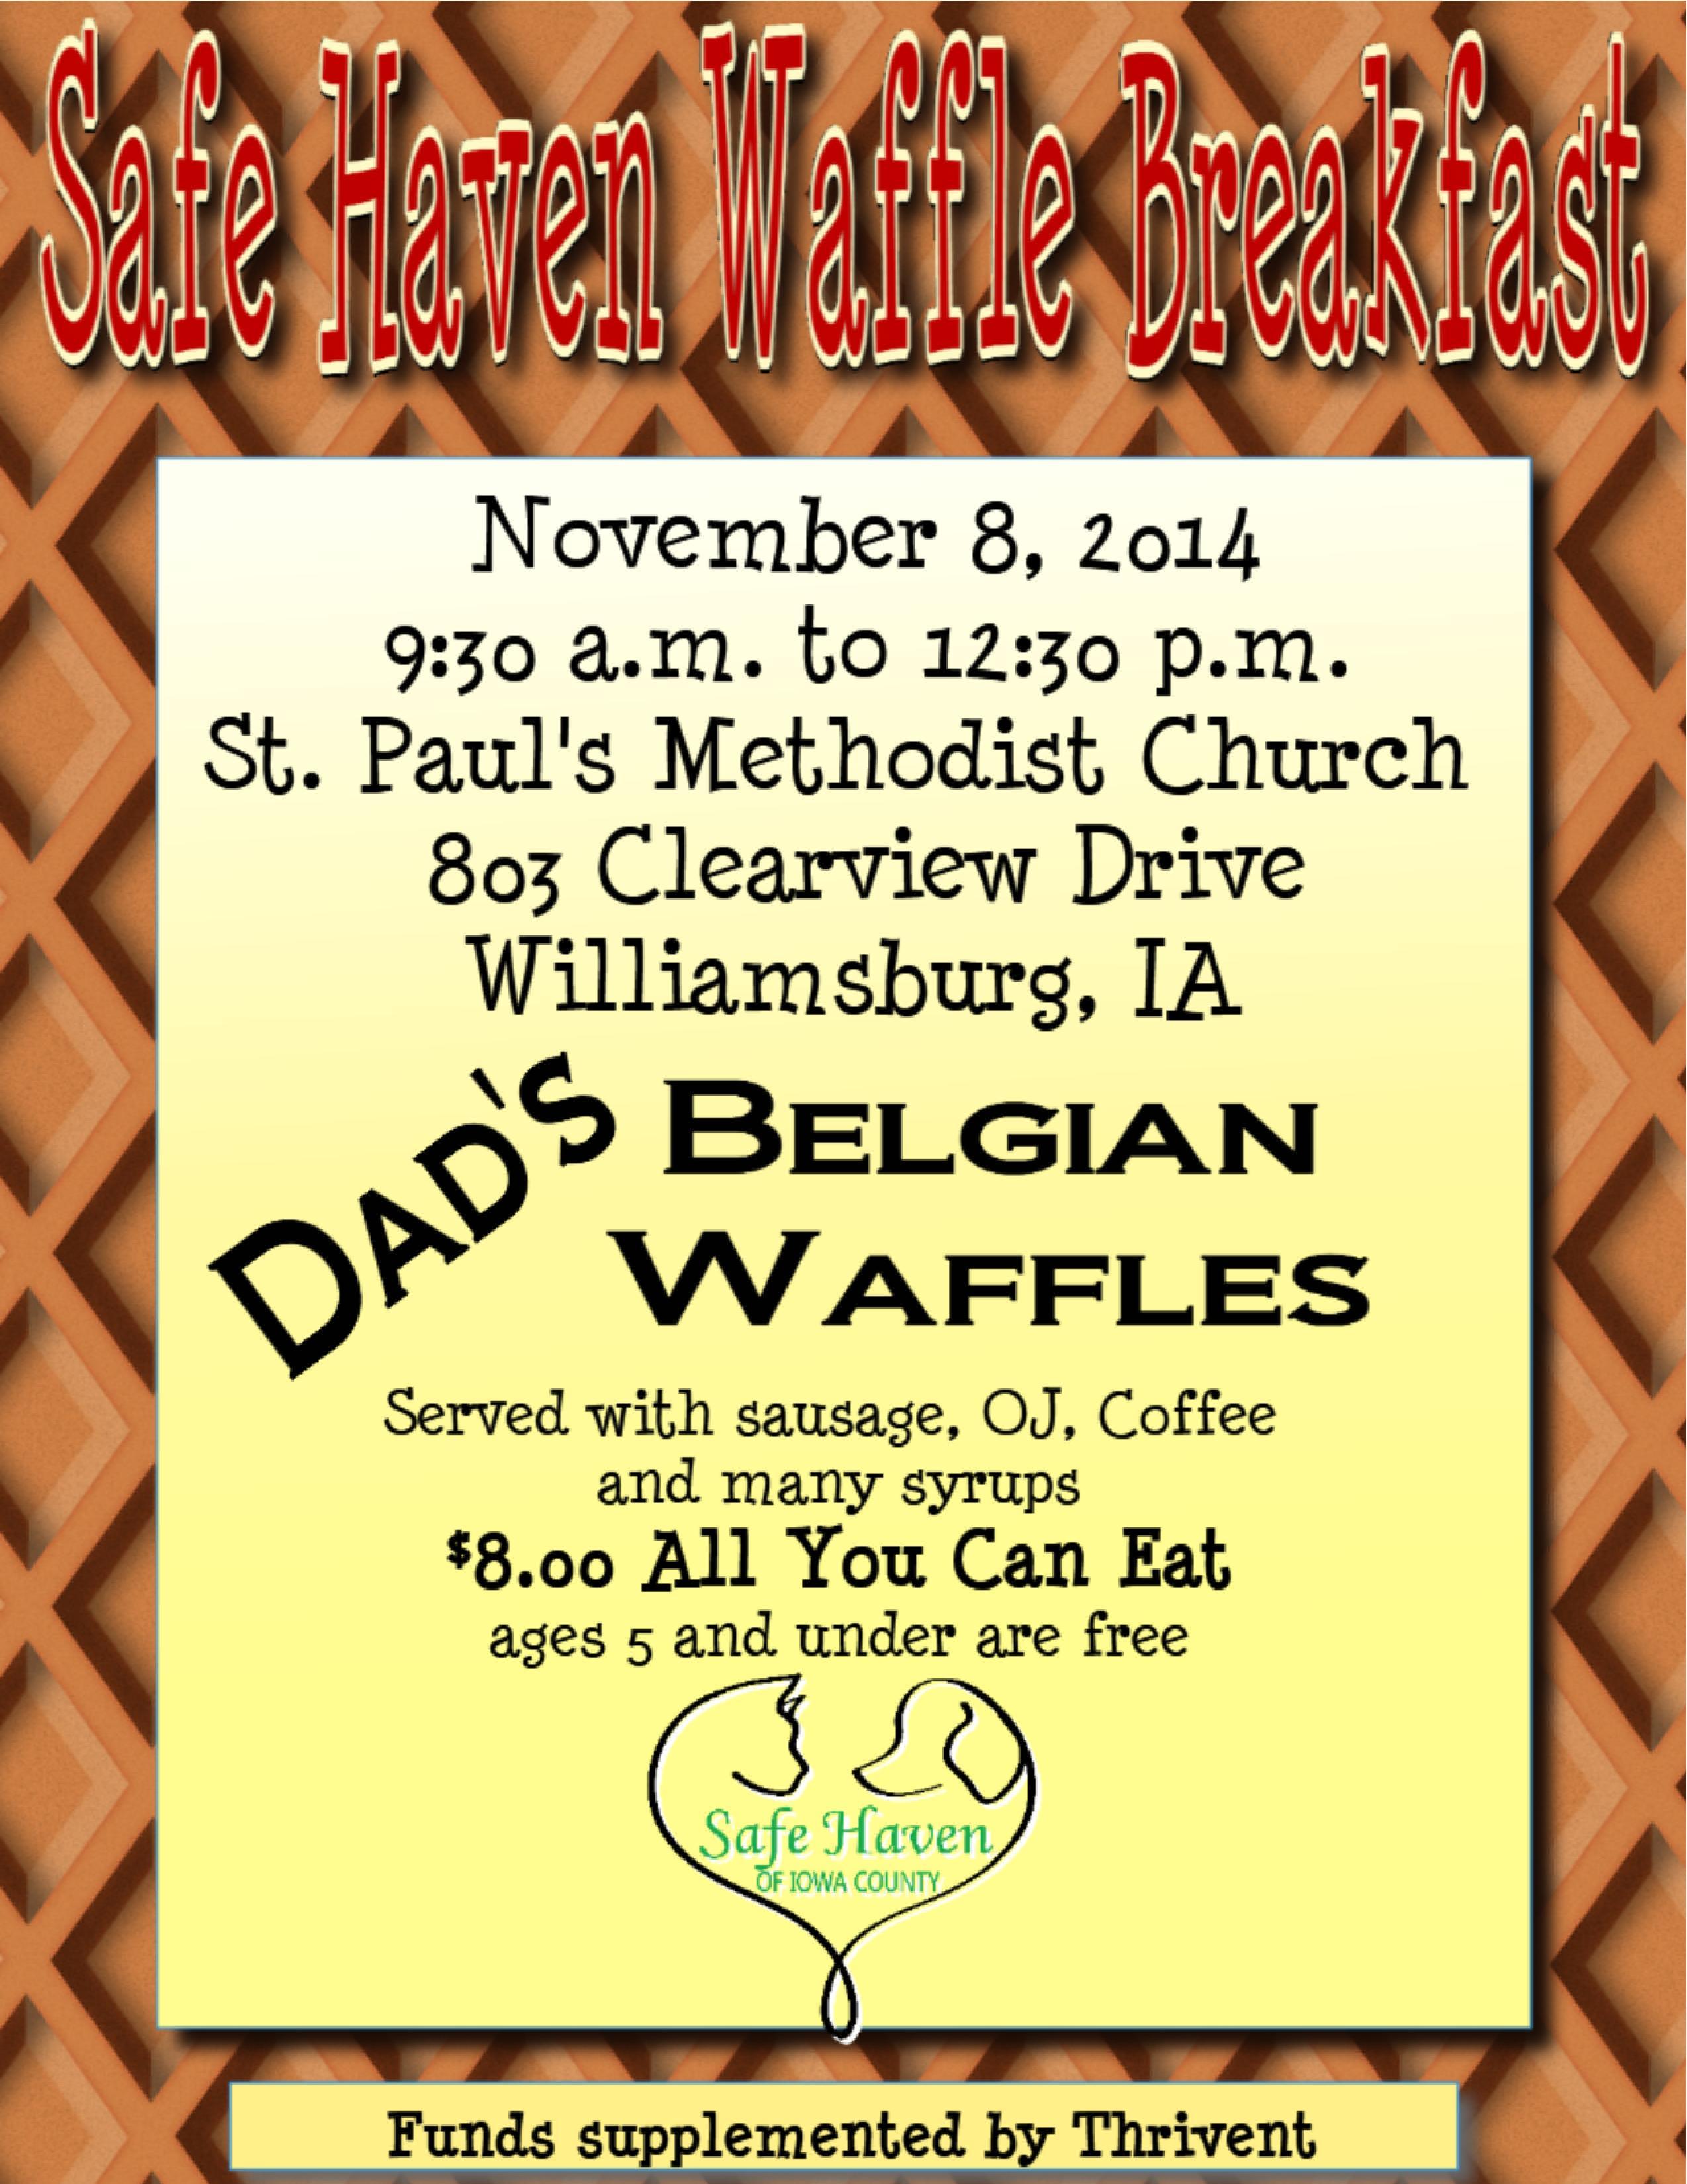 waffle bfast fall 2014